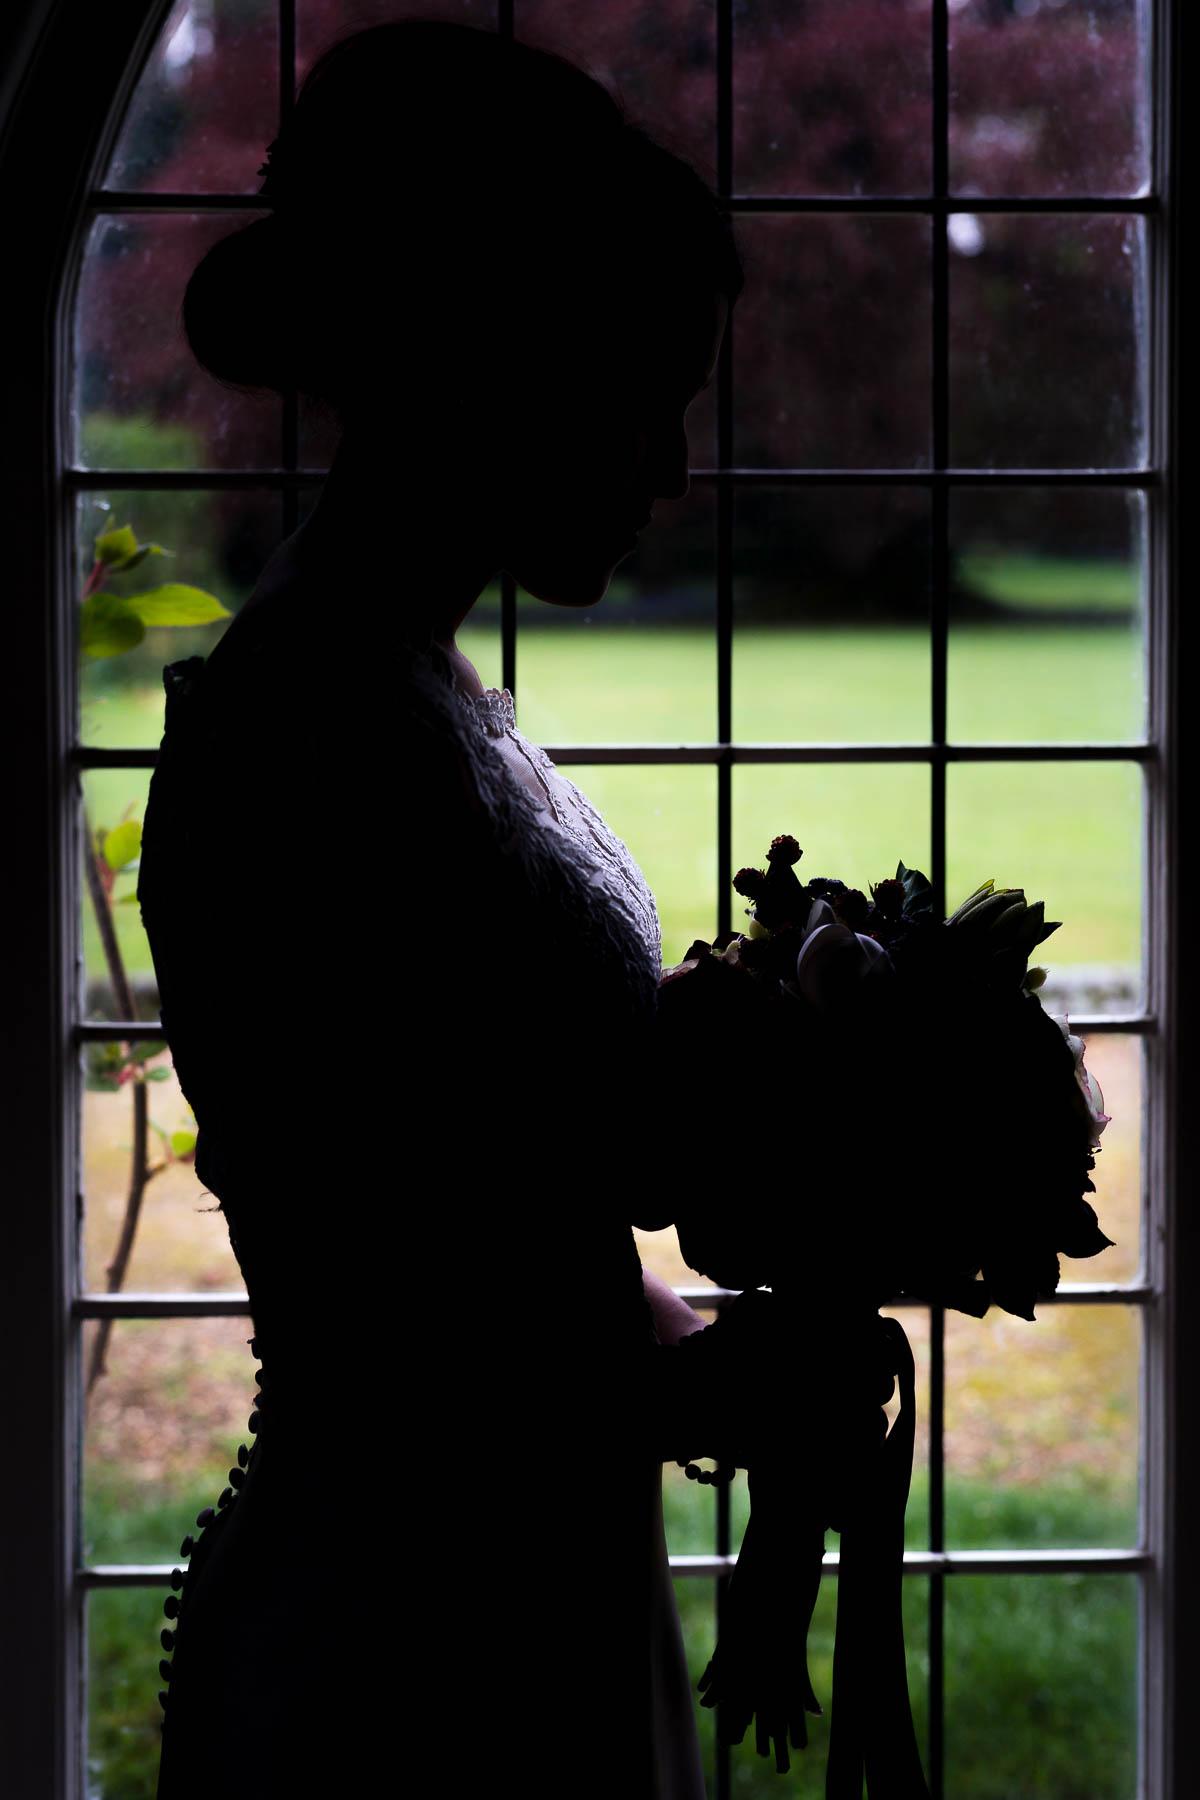 silhouette wedding photo ideas bride